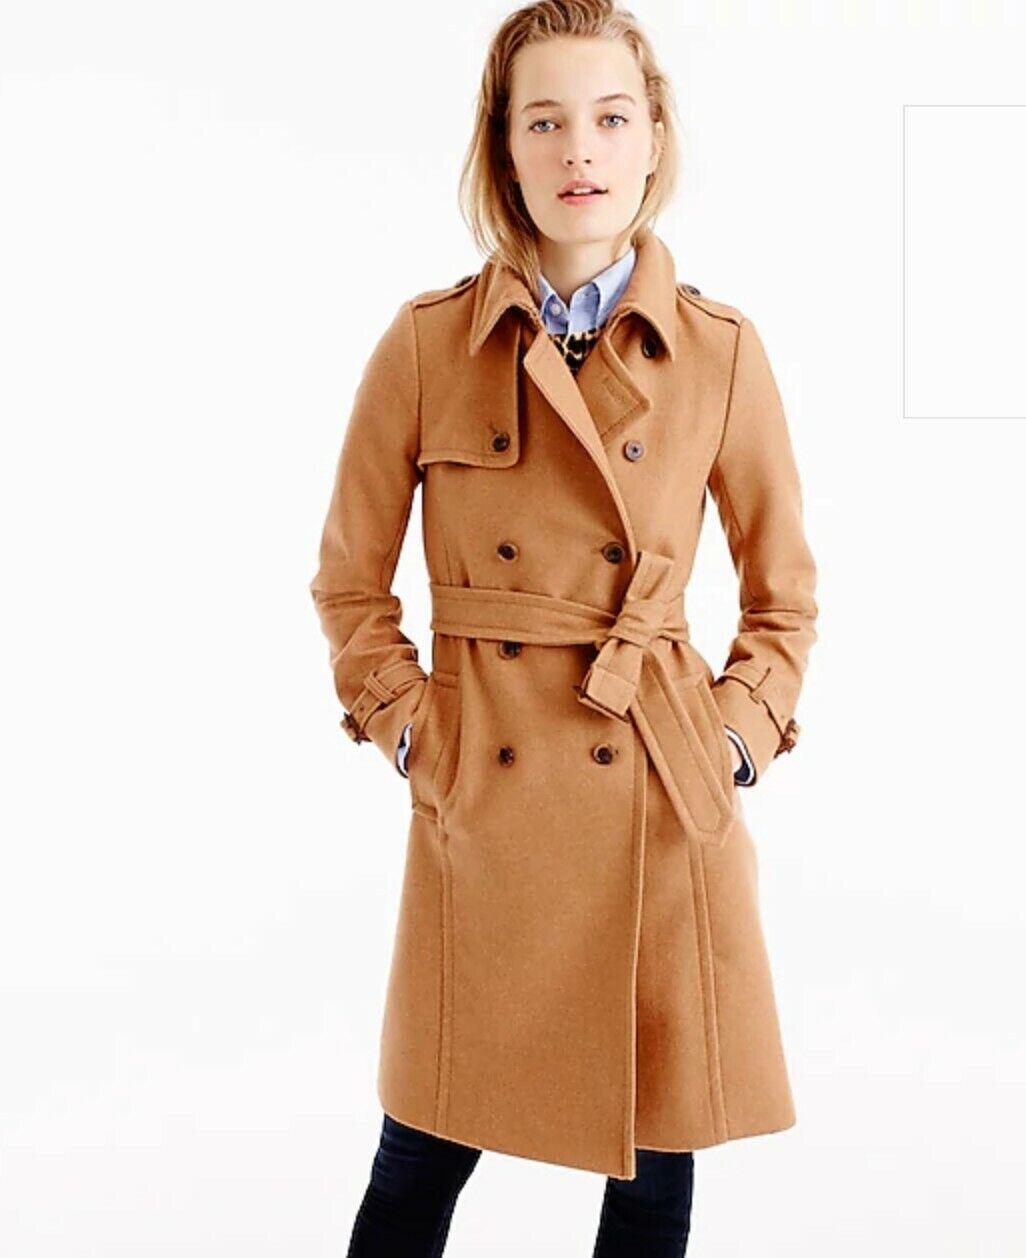 Nuevo Abrigo Trench J. CREW icono  en italiano de lana de Cachemira Abrigo Talla 0  365  compras de moda online